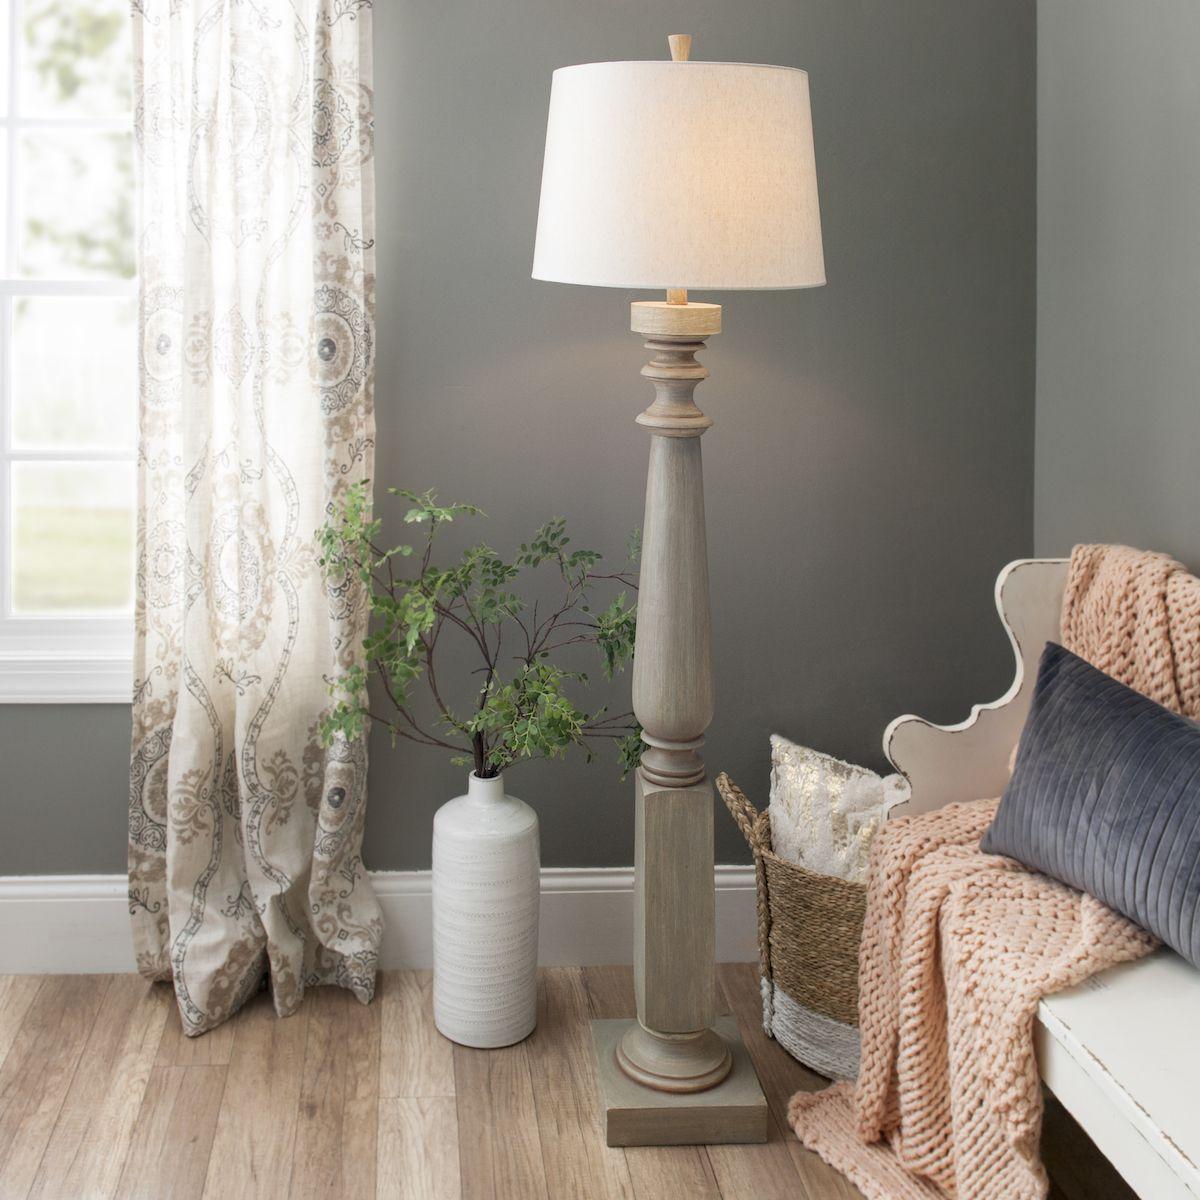 Crawford Creek Turned Floor Lamp Tall floor lamps, Floor